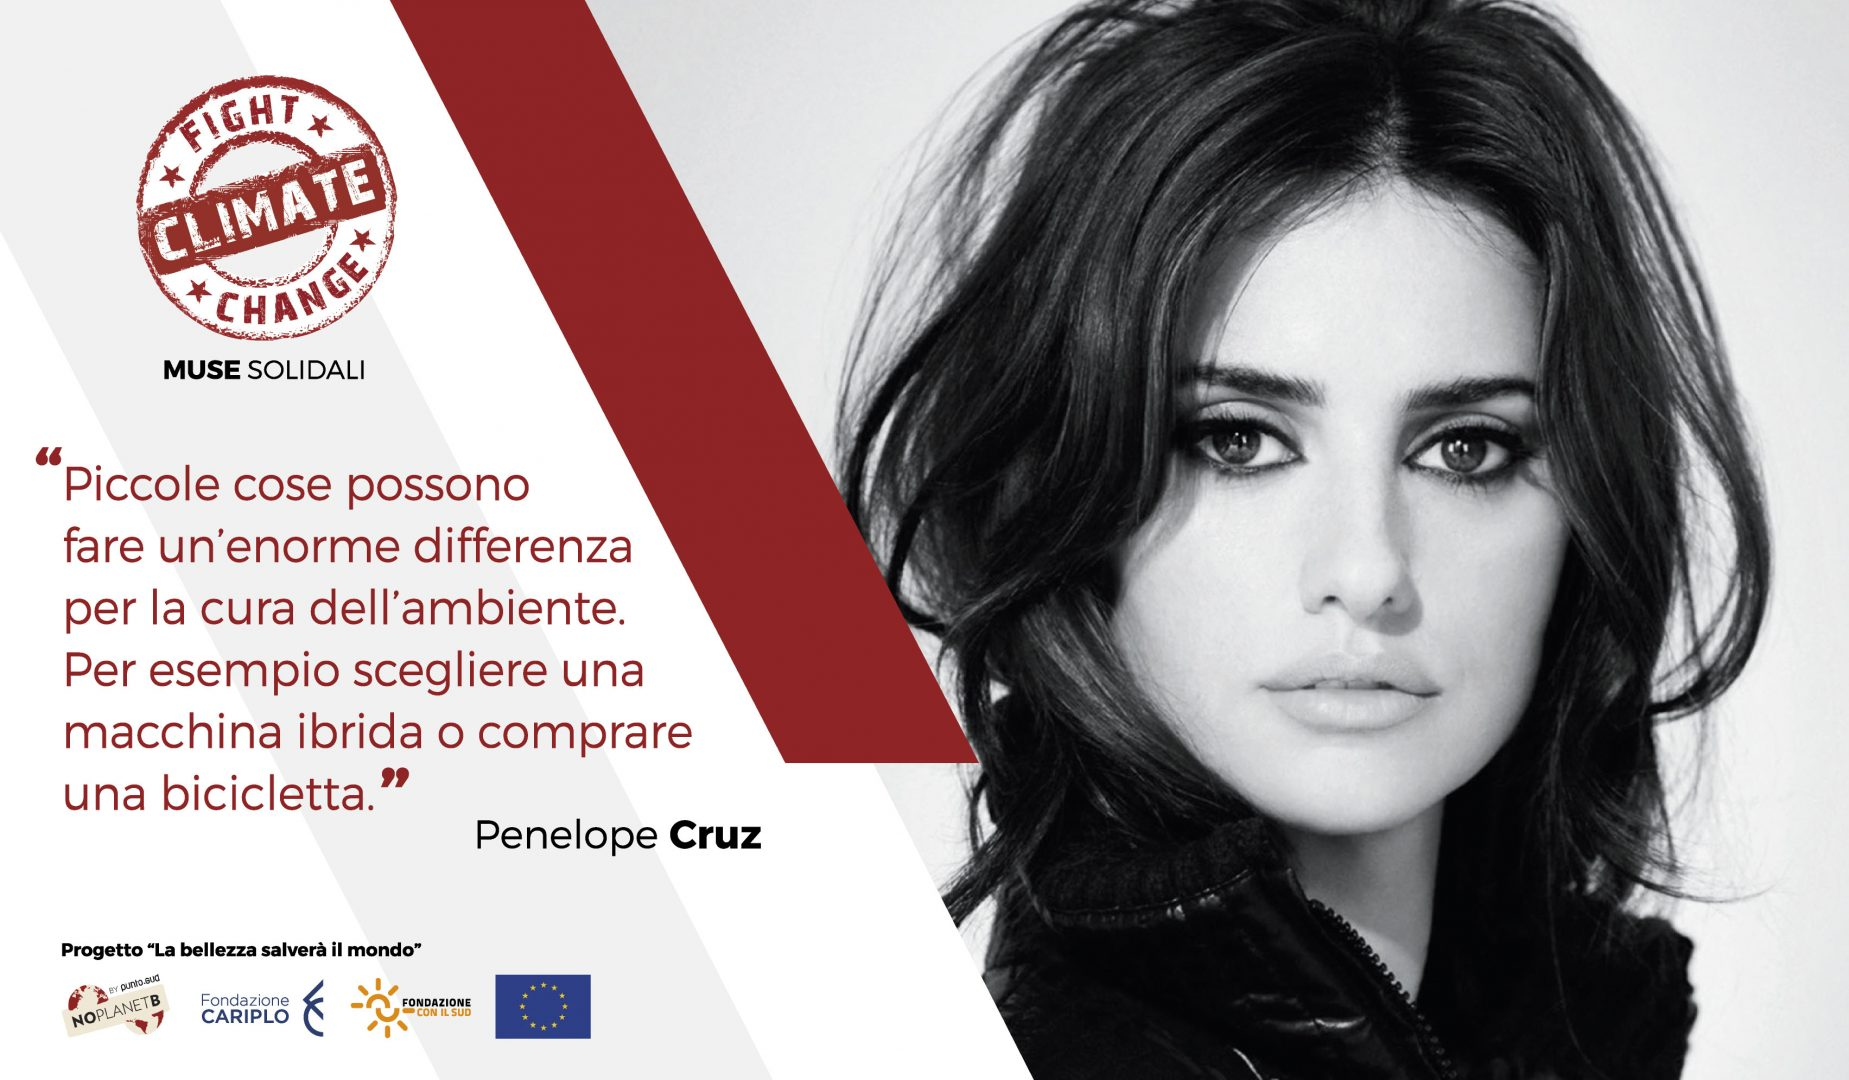 Penelope-Cruz-pannello-120x70